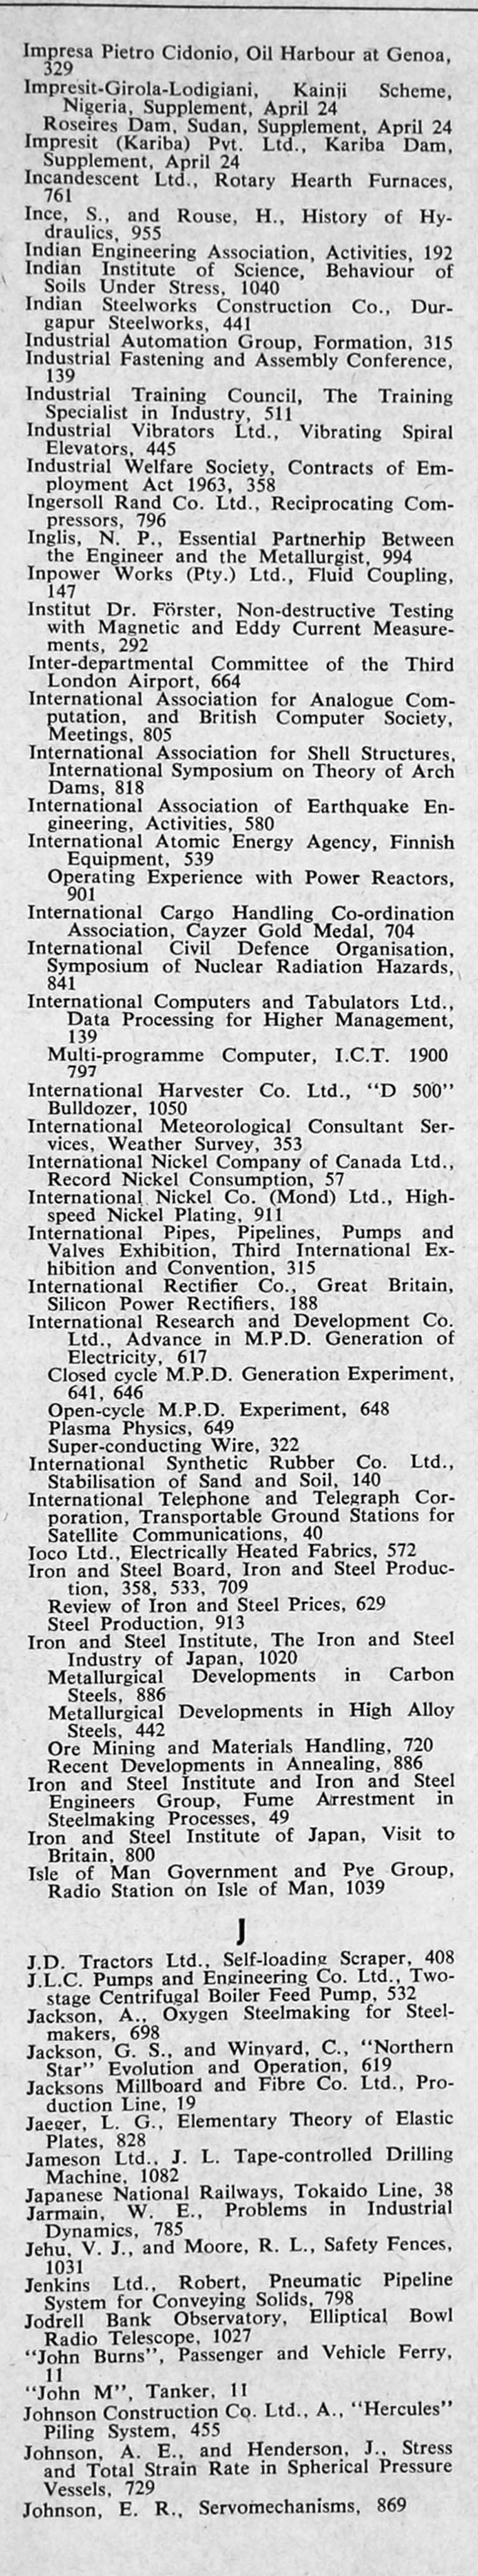 The Engineer 1964 Jan-Jun: Index